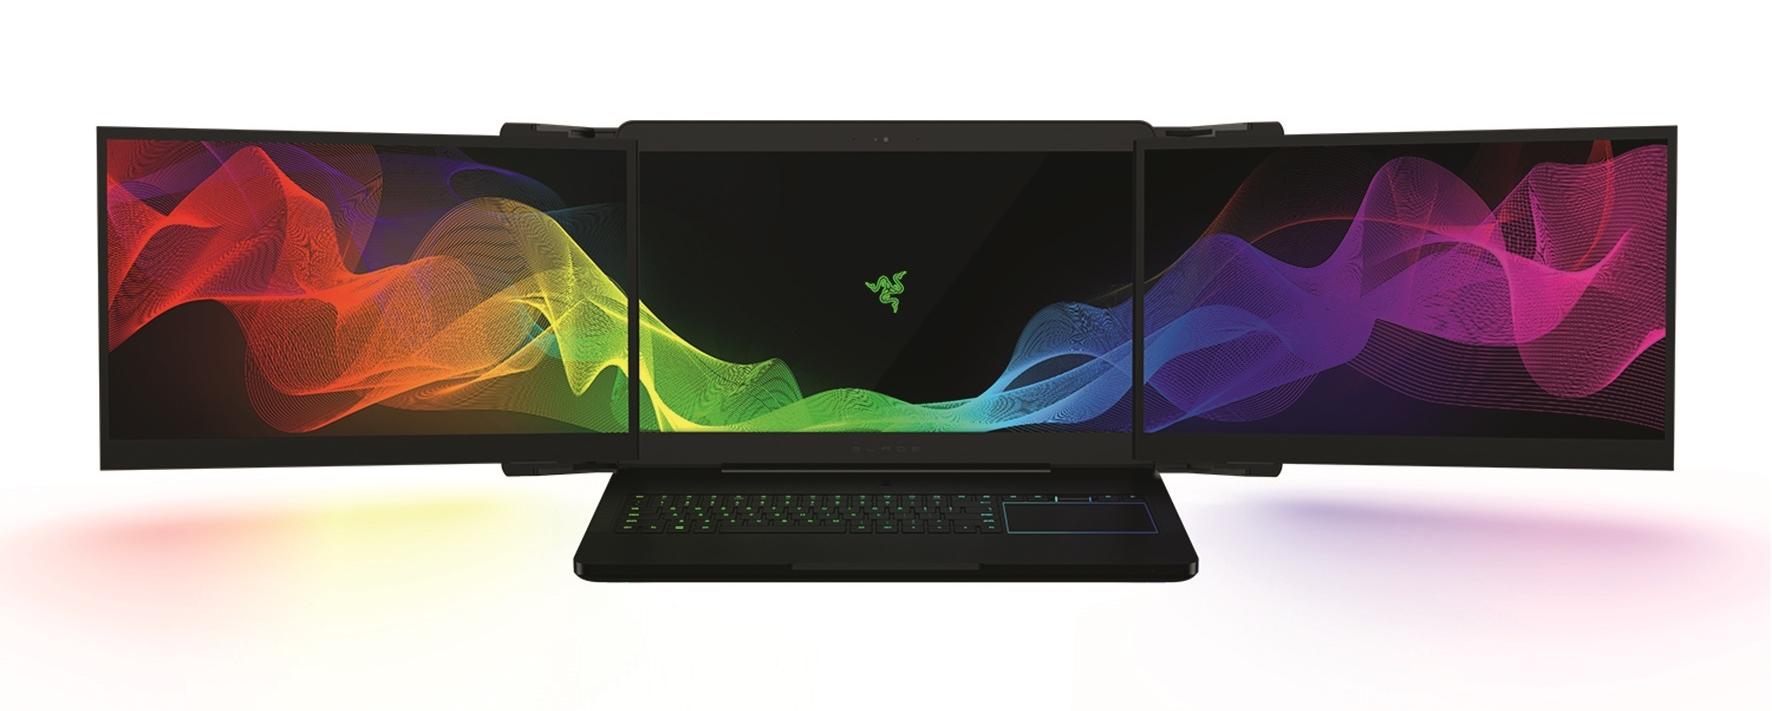 RAZER PROJECT VALERIE: Prvi laptop s trima ekranima